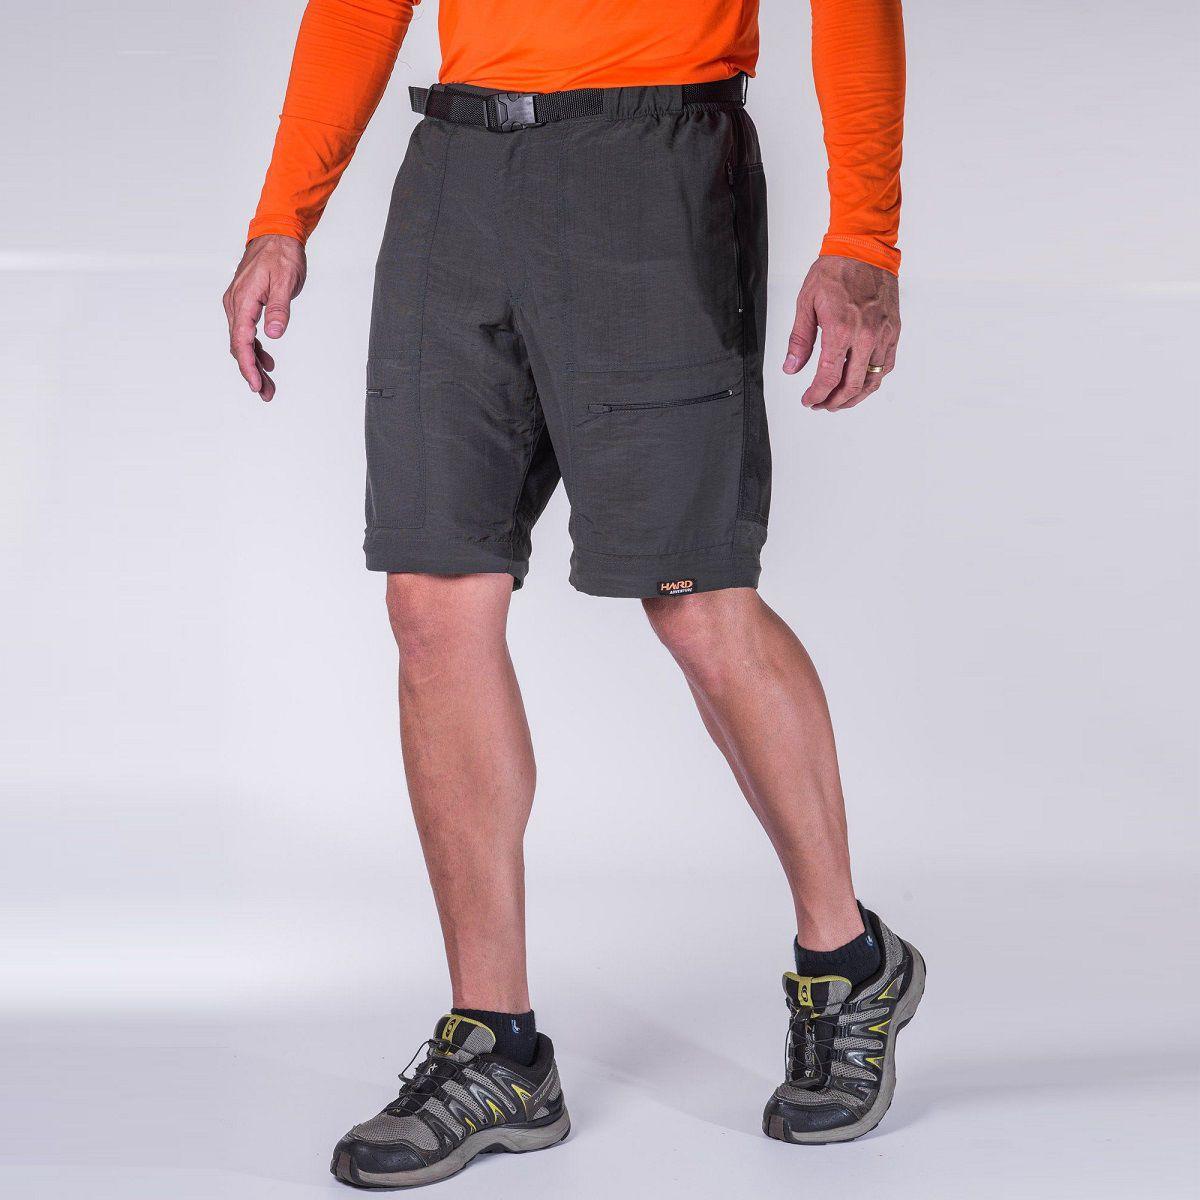 Calça-Bermuda Masculina reforçada com Cordura Hard Pro Mountain - Chumbo